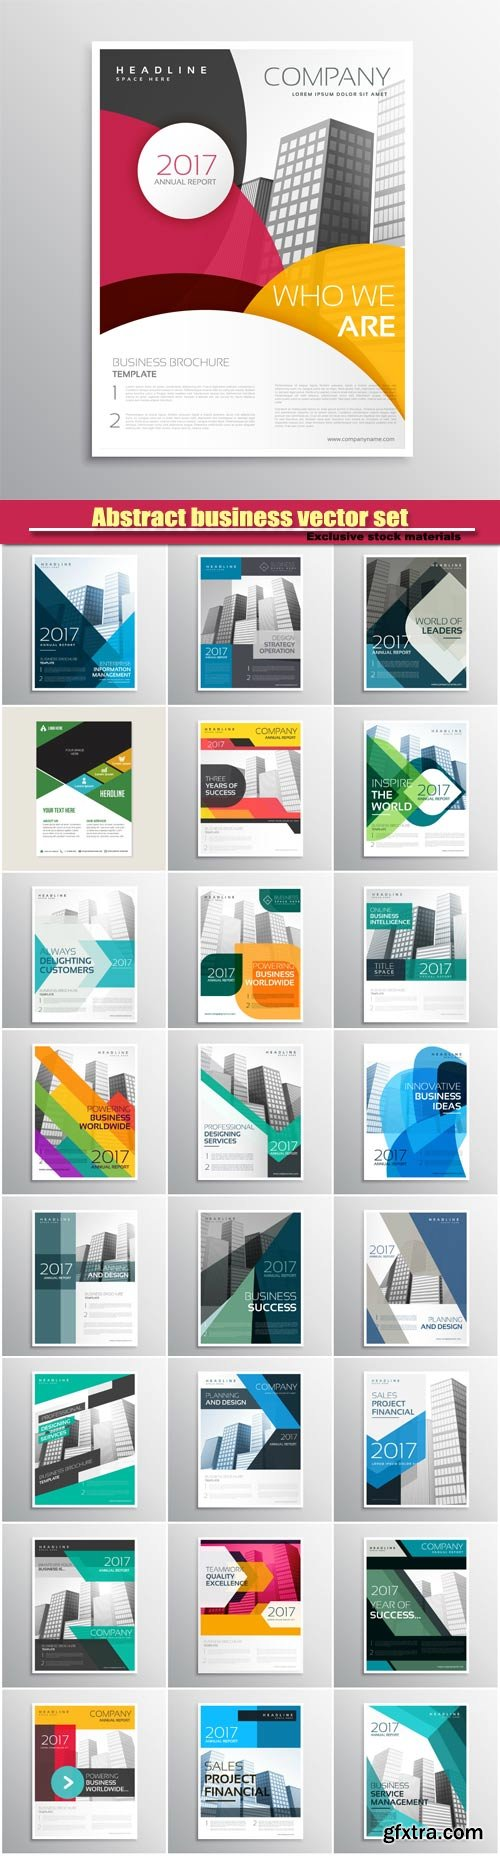 Corporate vector brand business brochure template